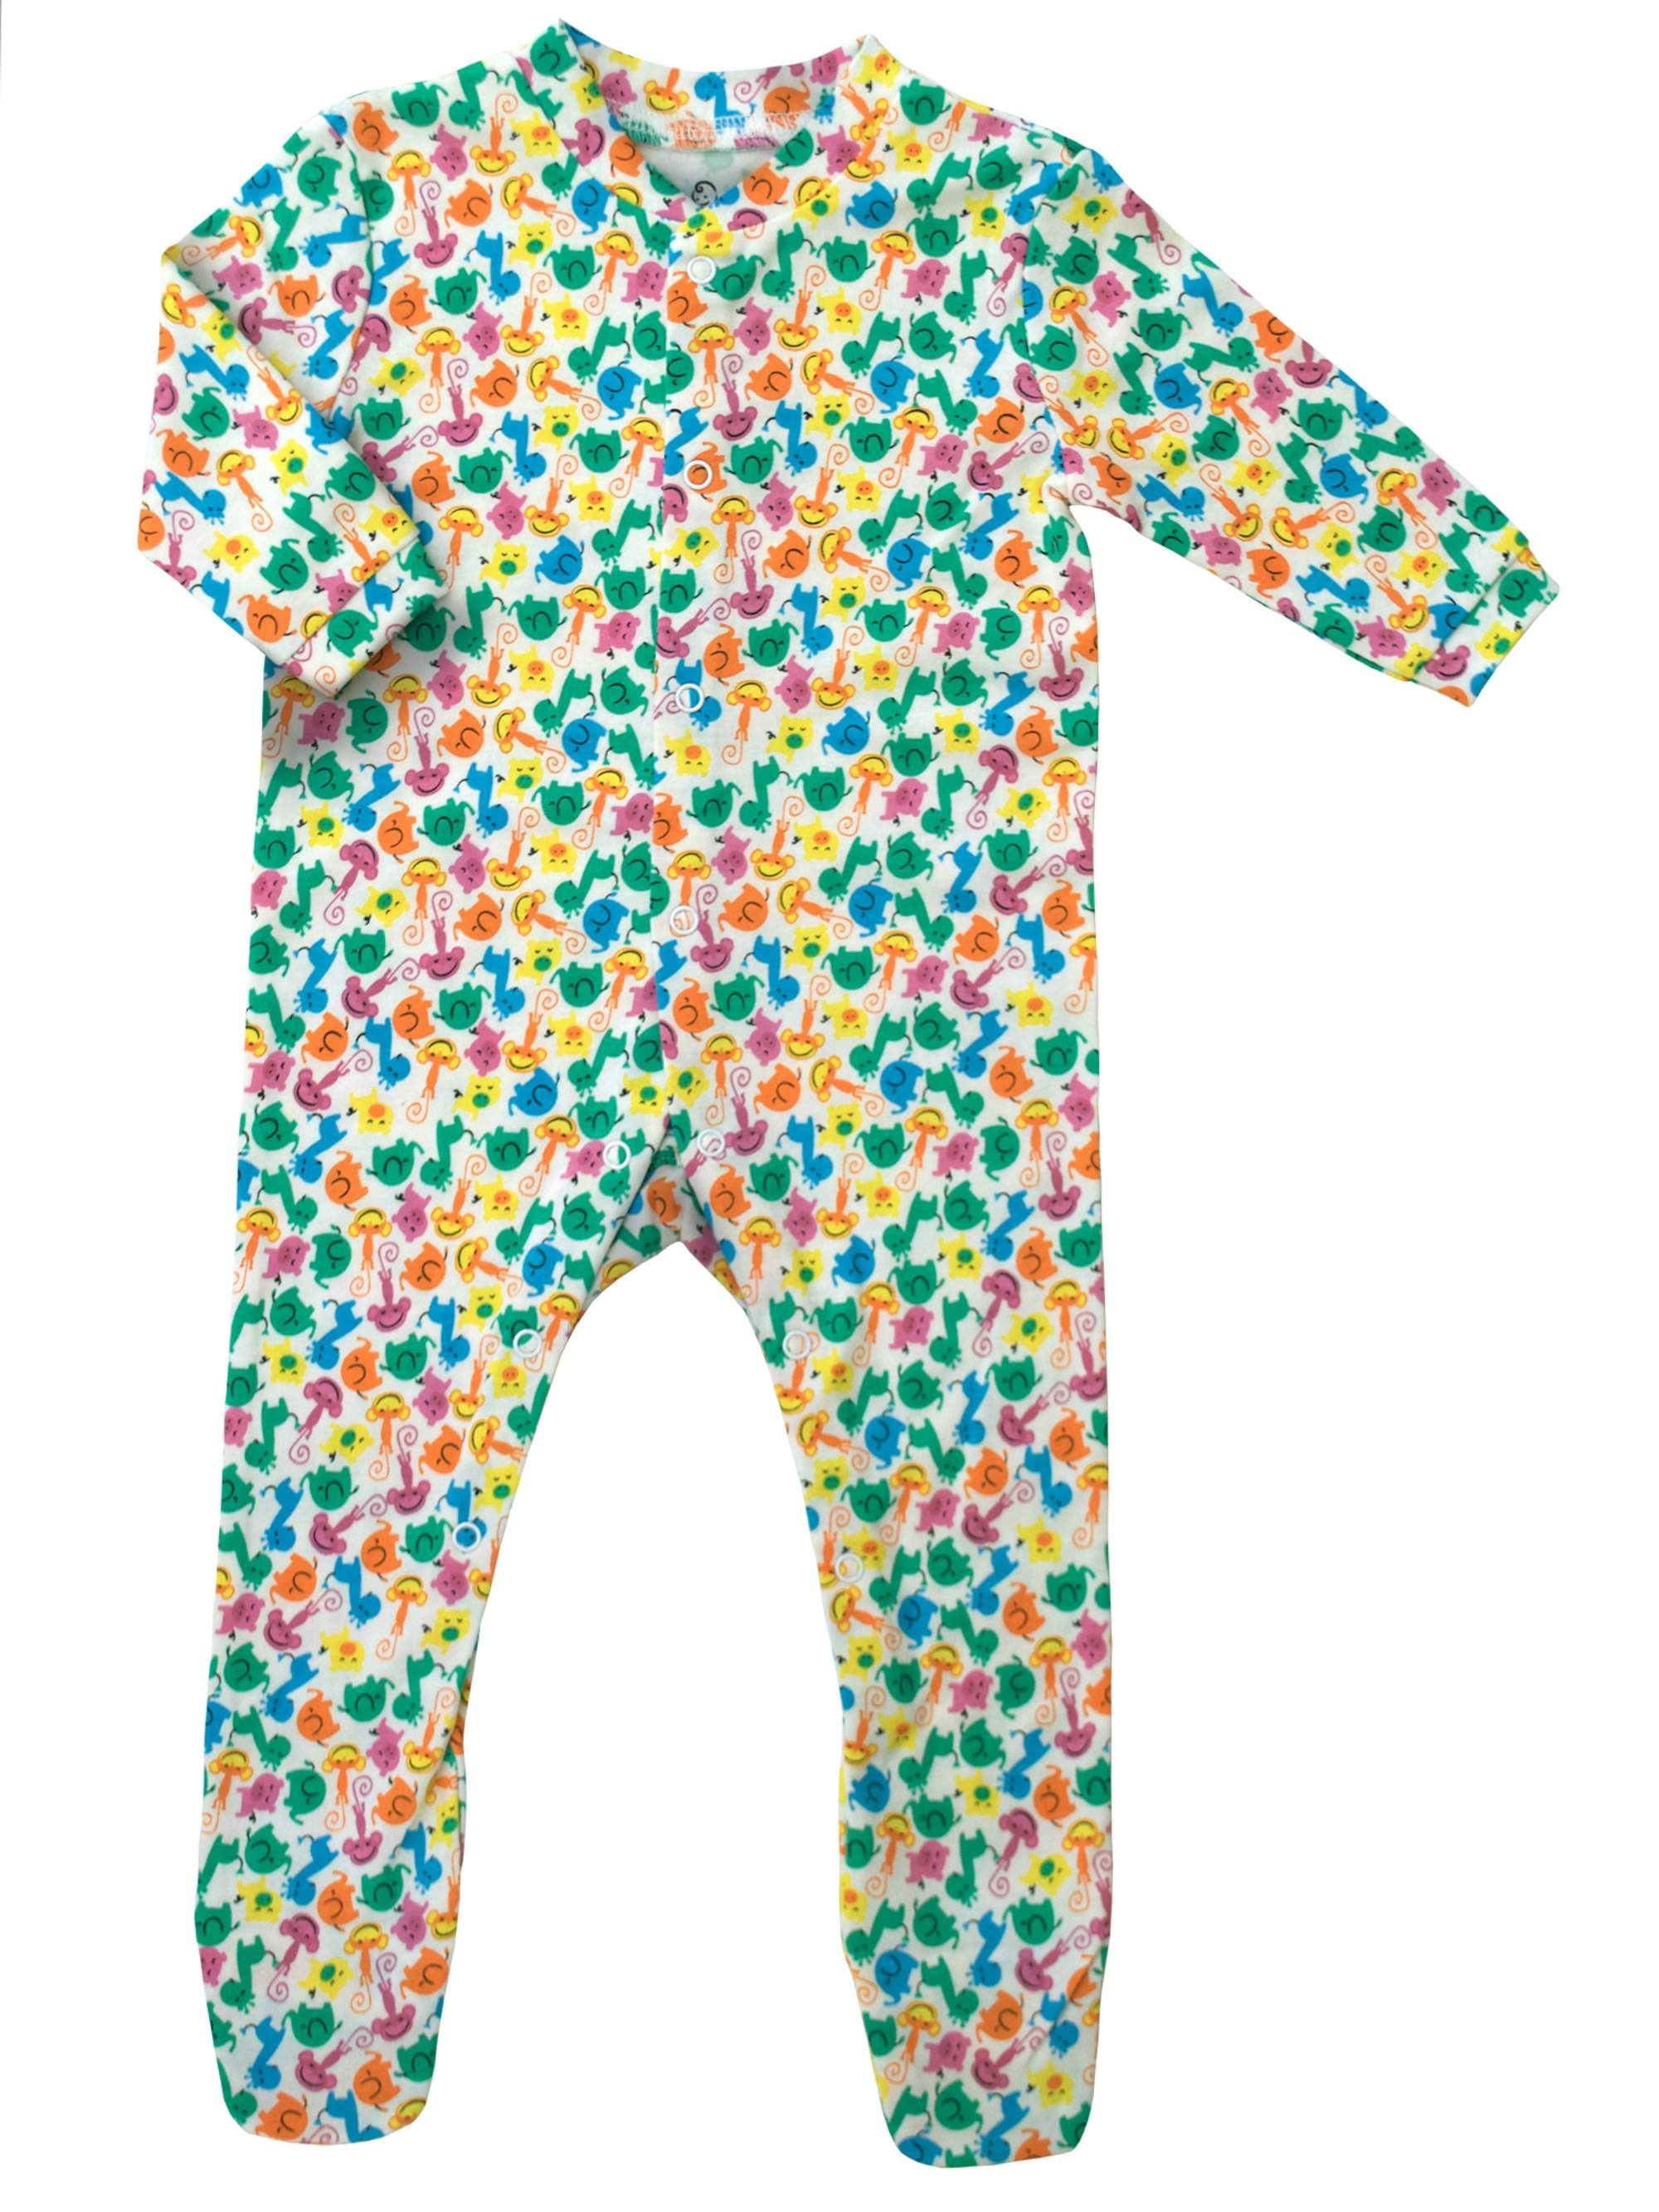 KidzStuff Long Sleeve Baby Insect Repellent Pajamas (Unisex)